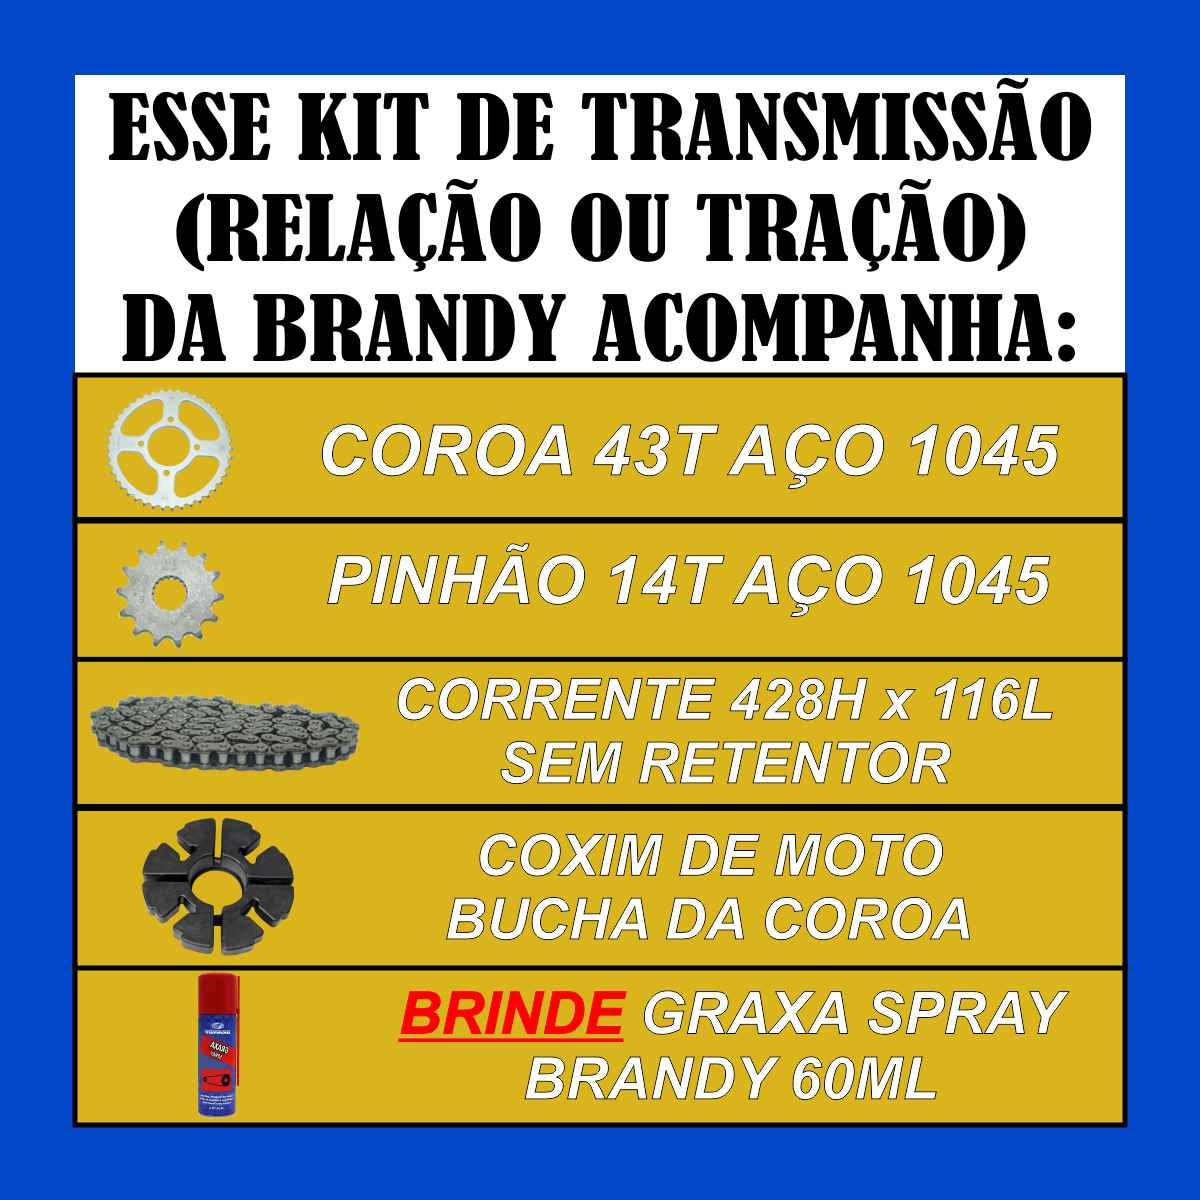 KIT RELAÇÃO TRANSMISSÃO MOTO SUZUKI EN 125 YES SE TRAÇÃO + COXIM BUCHA DA COROA + GRAXA SPRAY 60ml